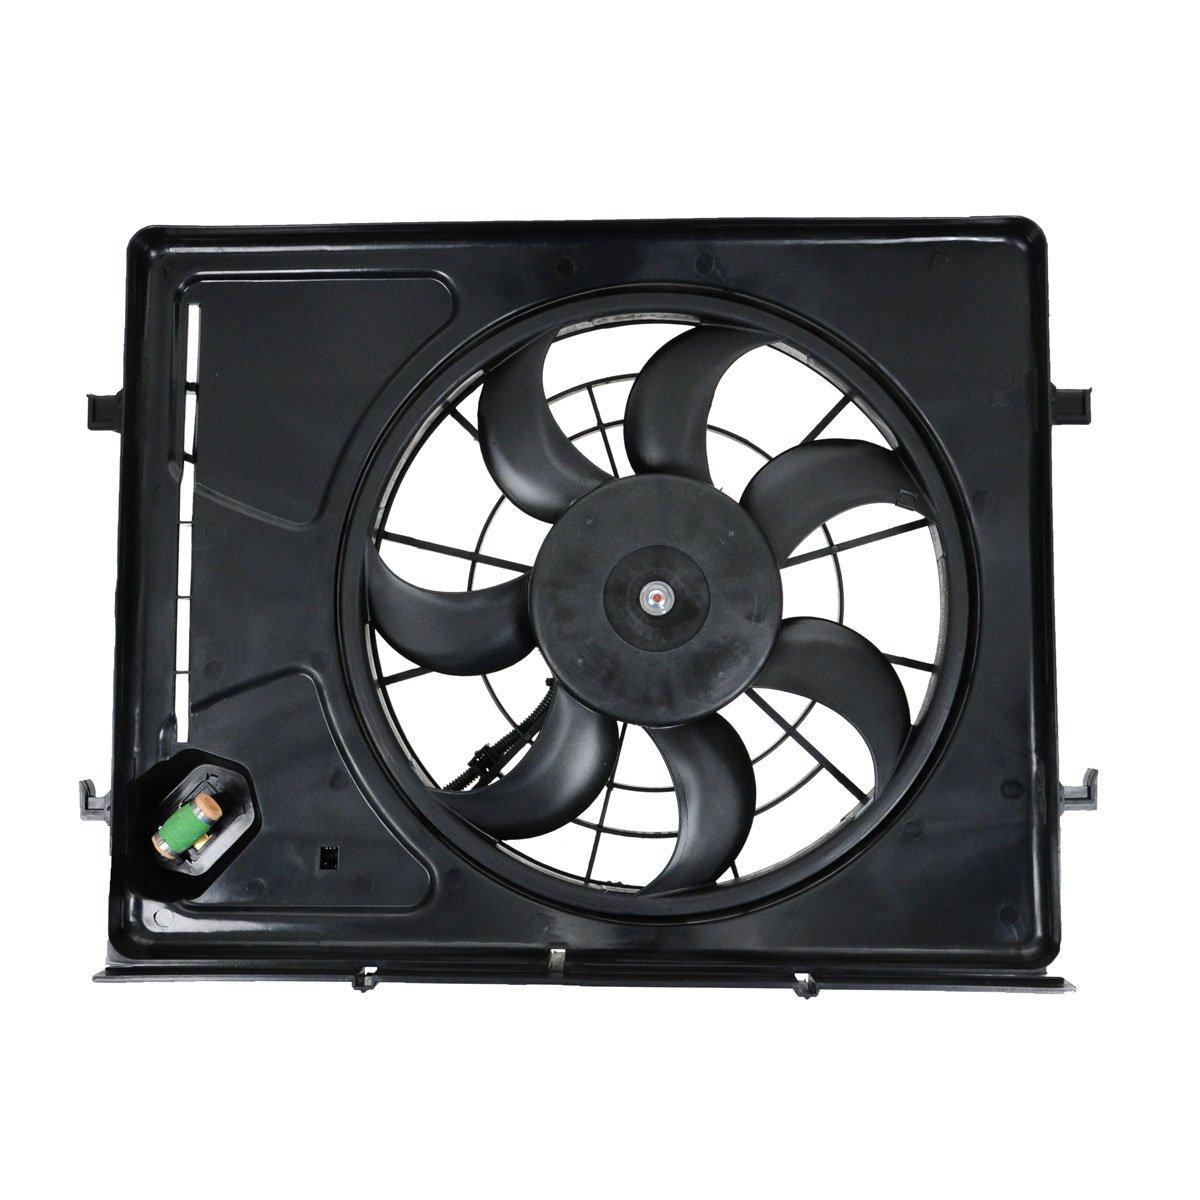 2.0L Radiator Cooling Fan Assembly 253802H150 Fits 07-10 Elantra